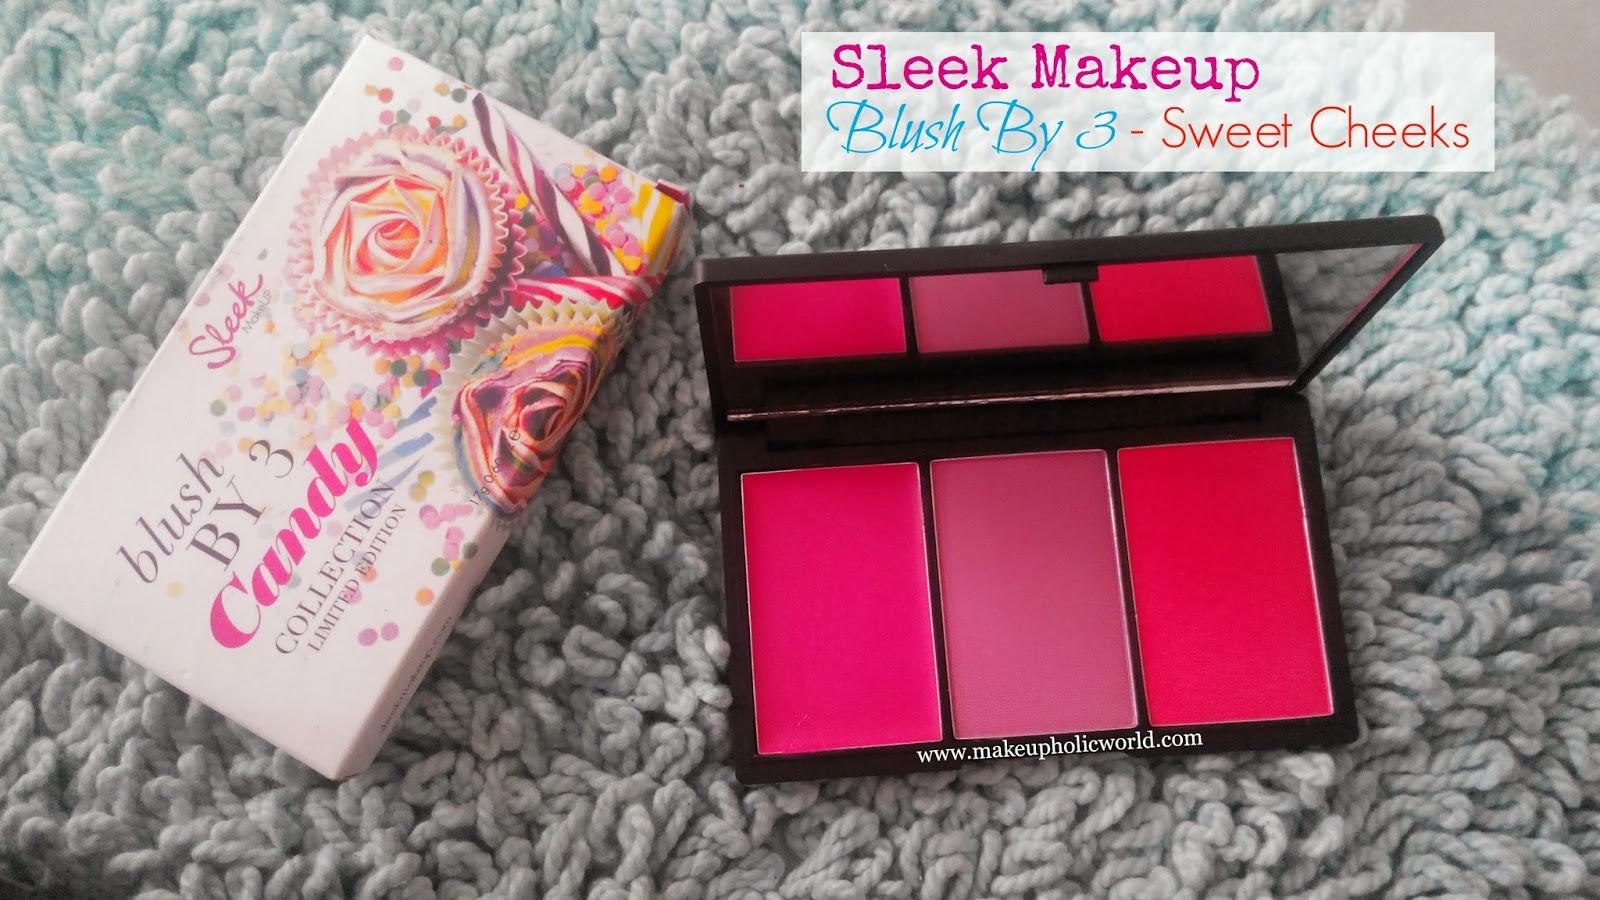 Sleek Makeup Blush By 3 – Sweet Cheeks